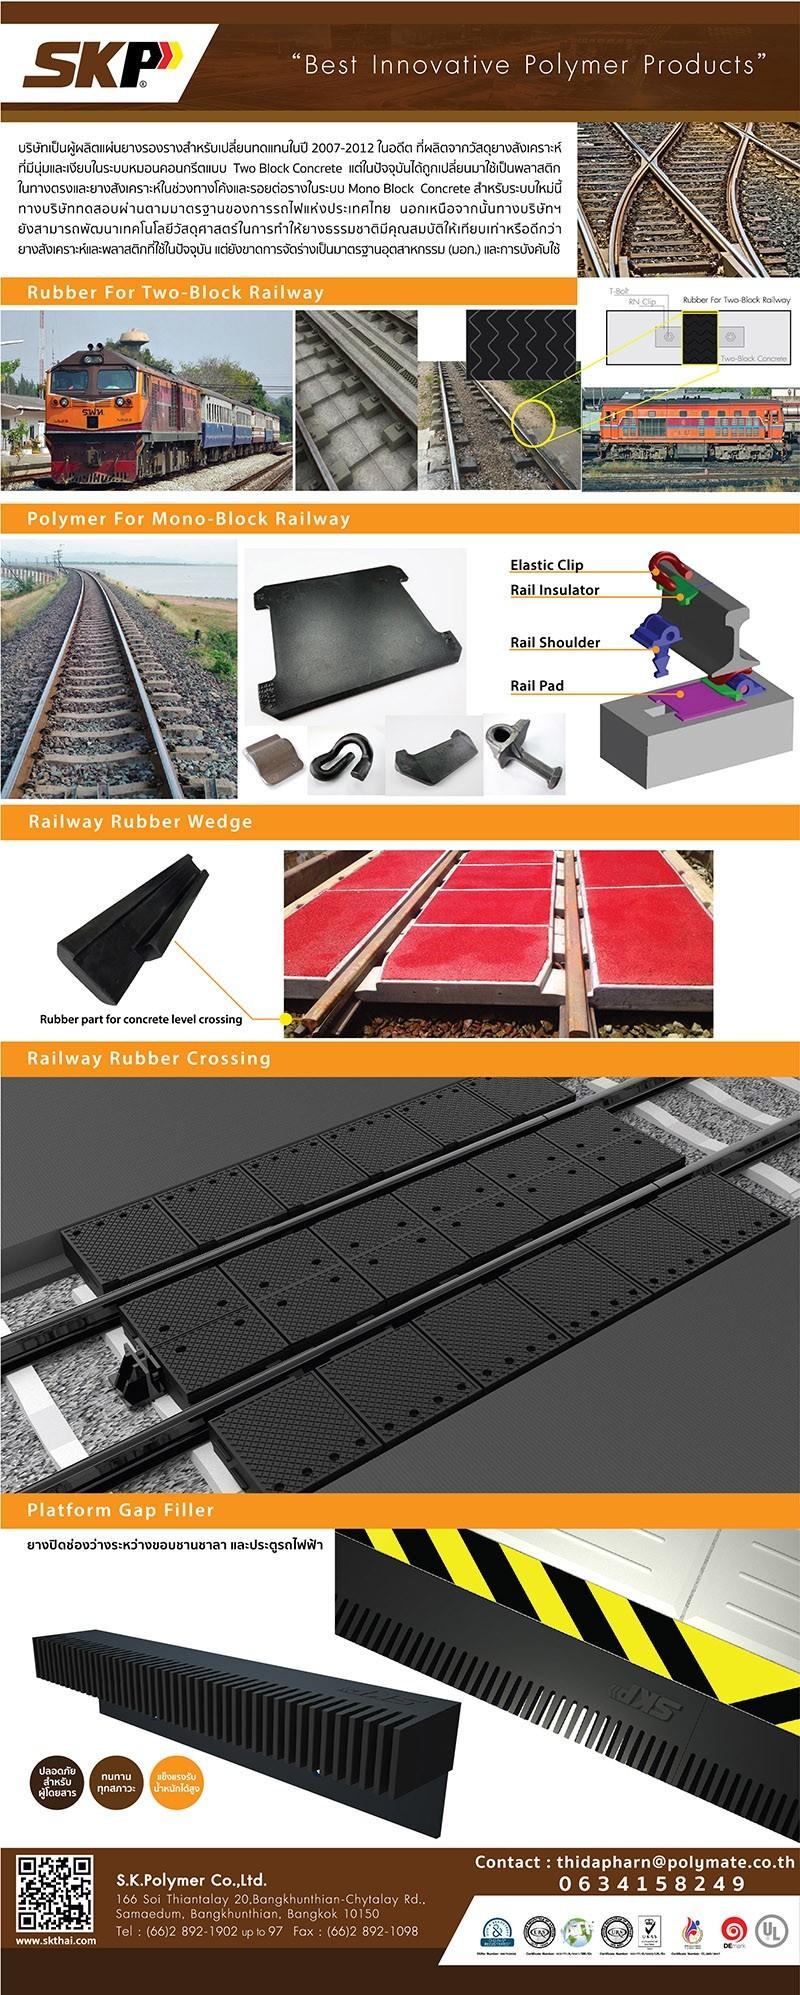 Railway Syatem